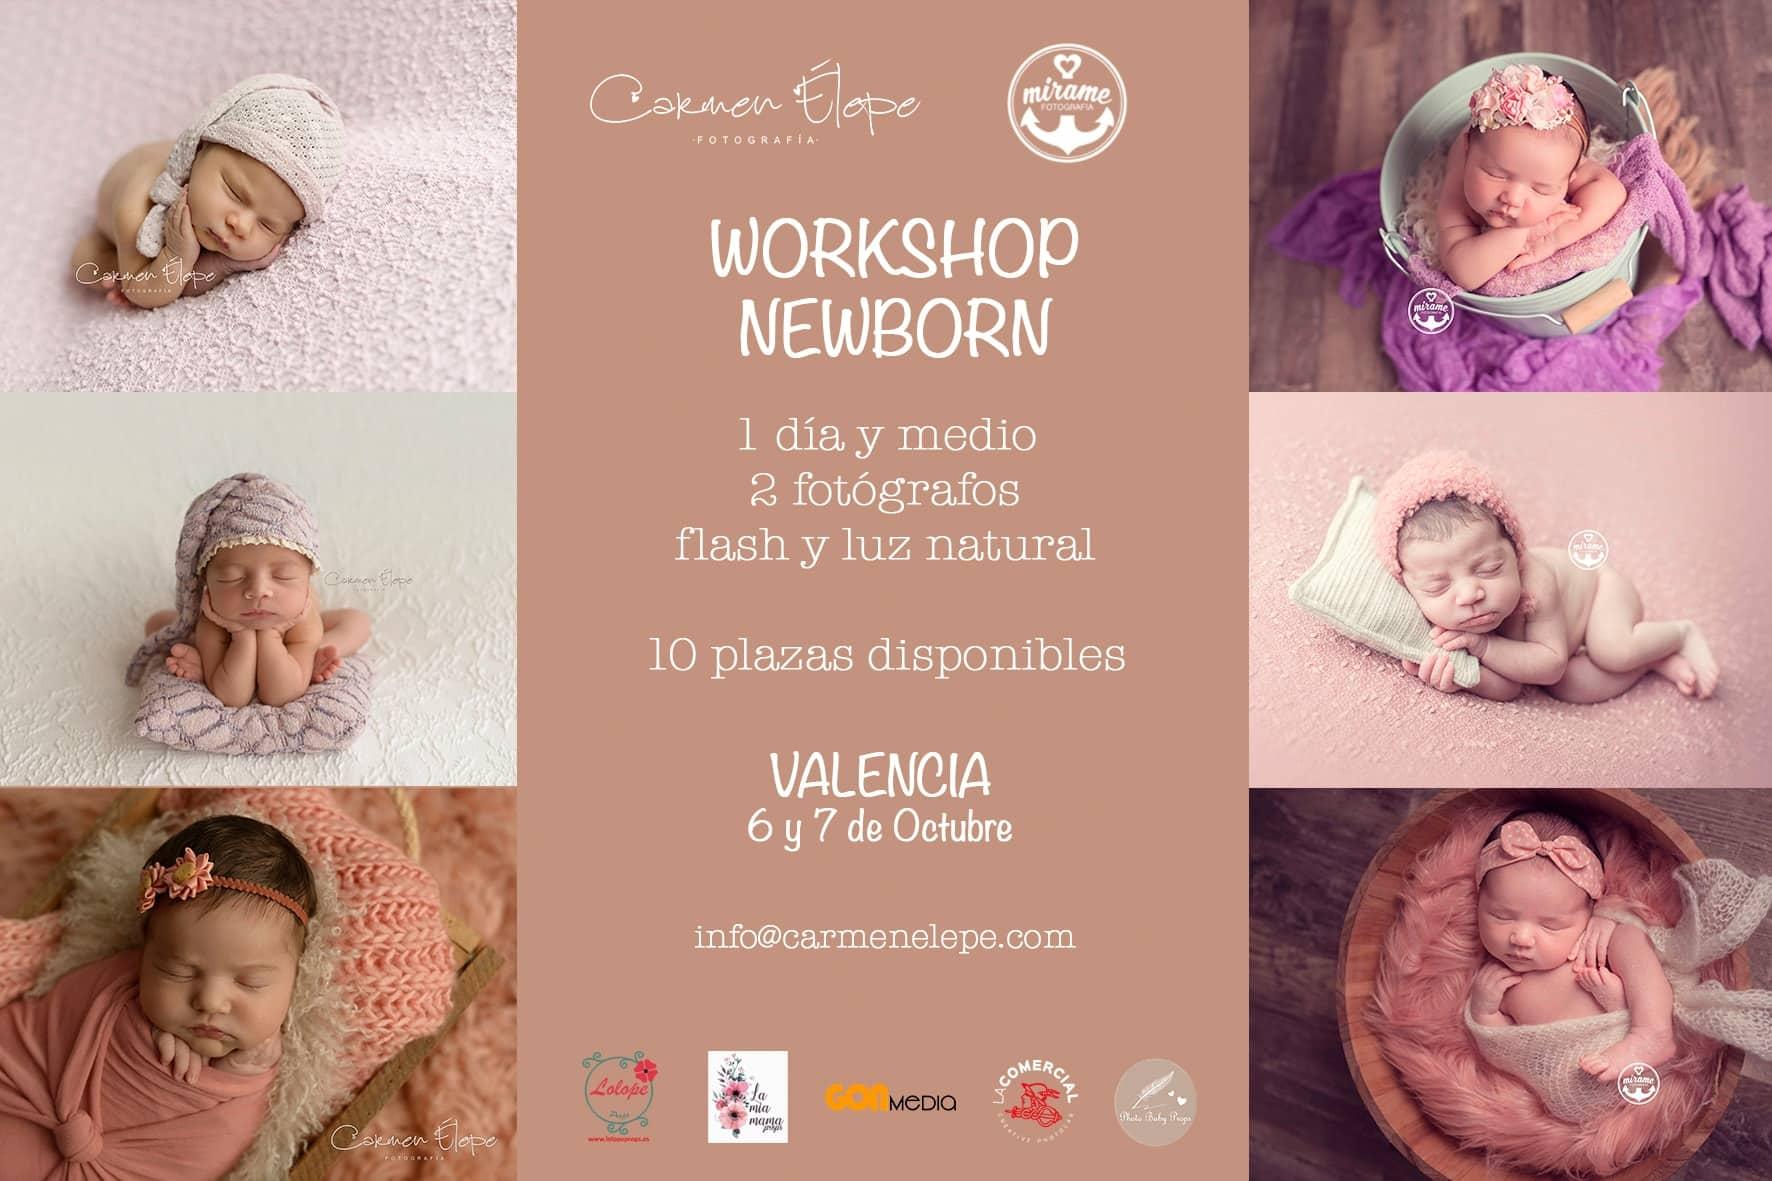 workshop fotografia newborn espana valencia alicante castellon carmen elepe mirame fotografia